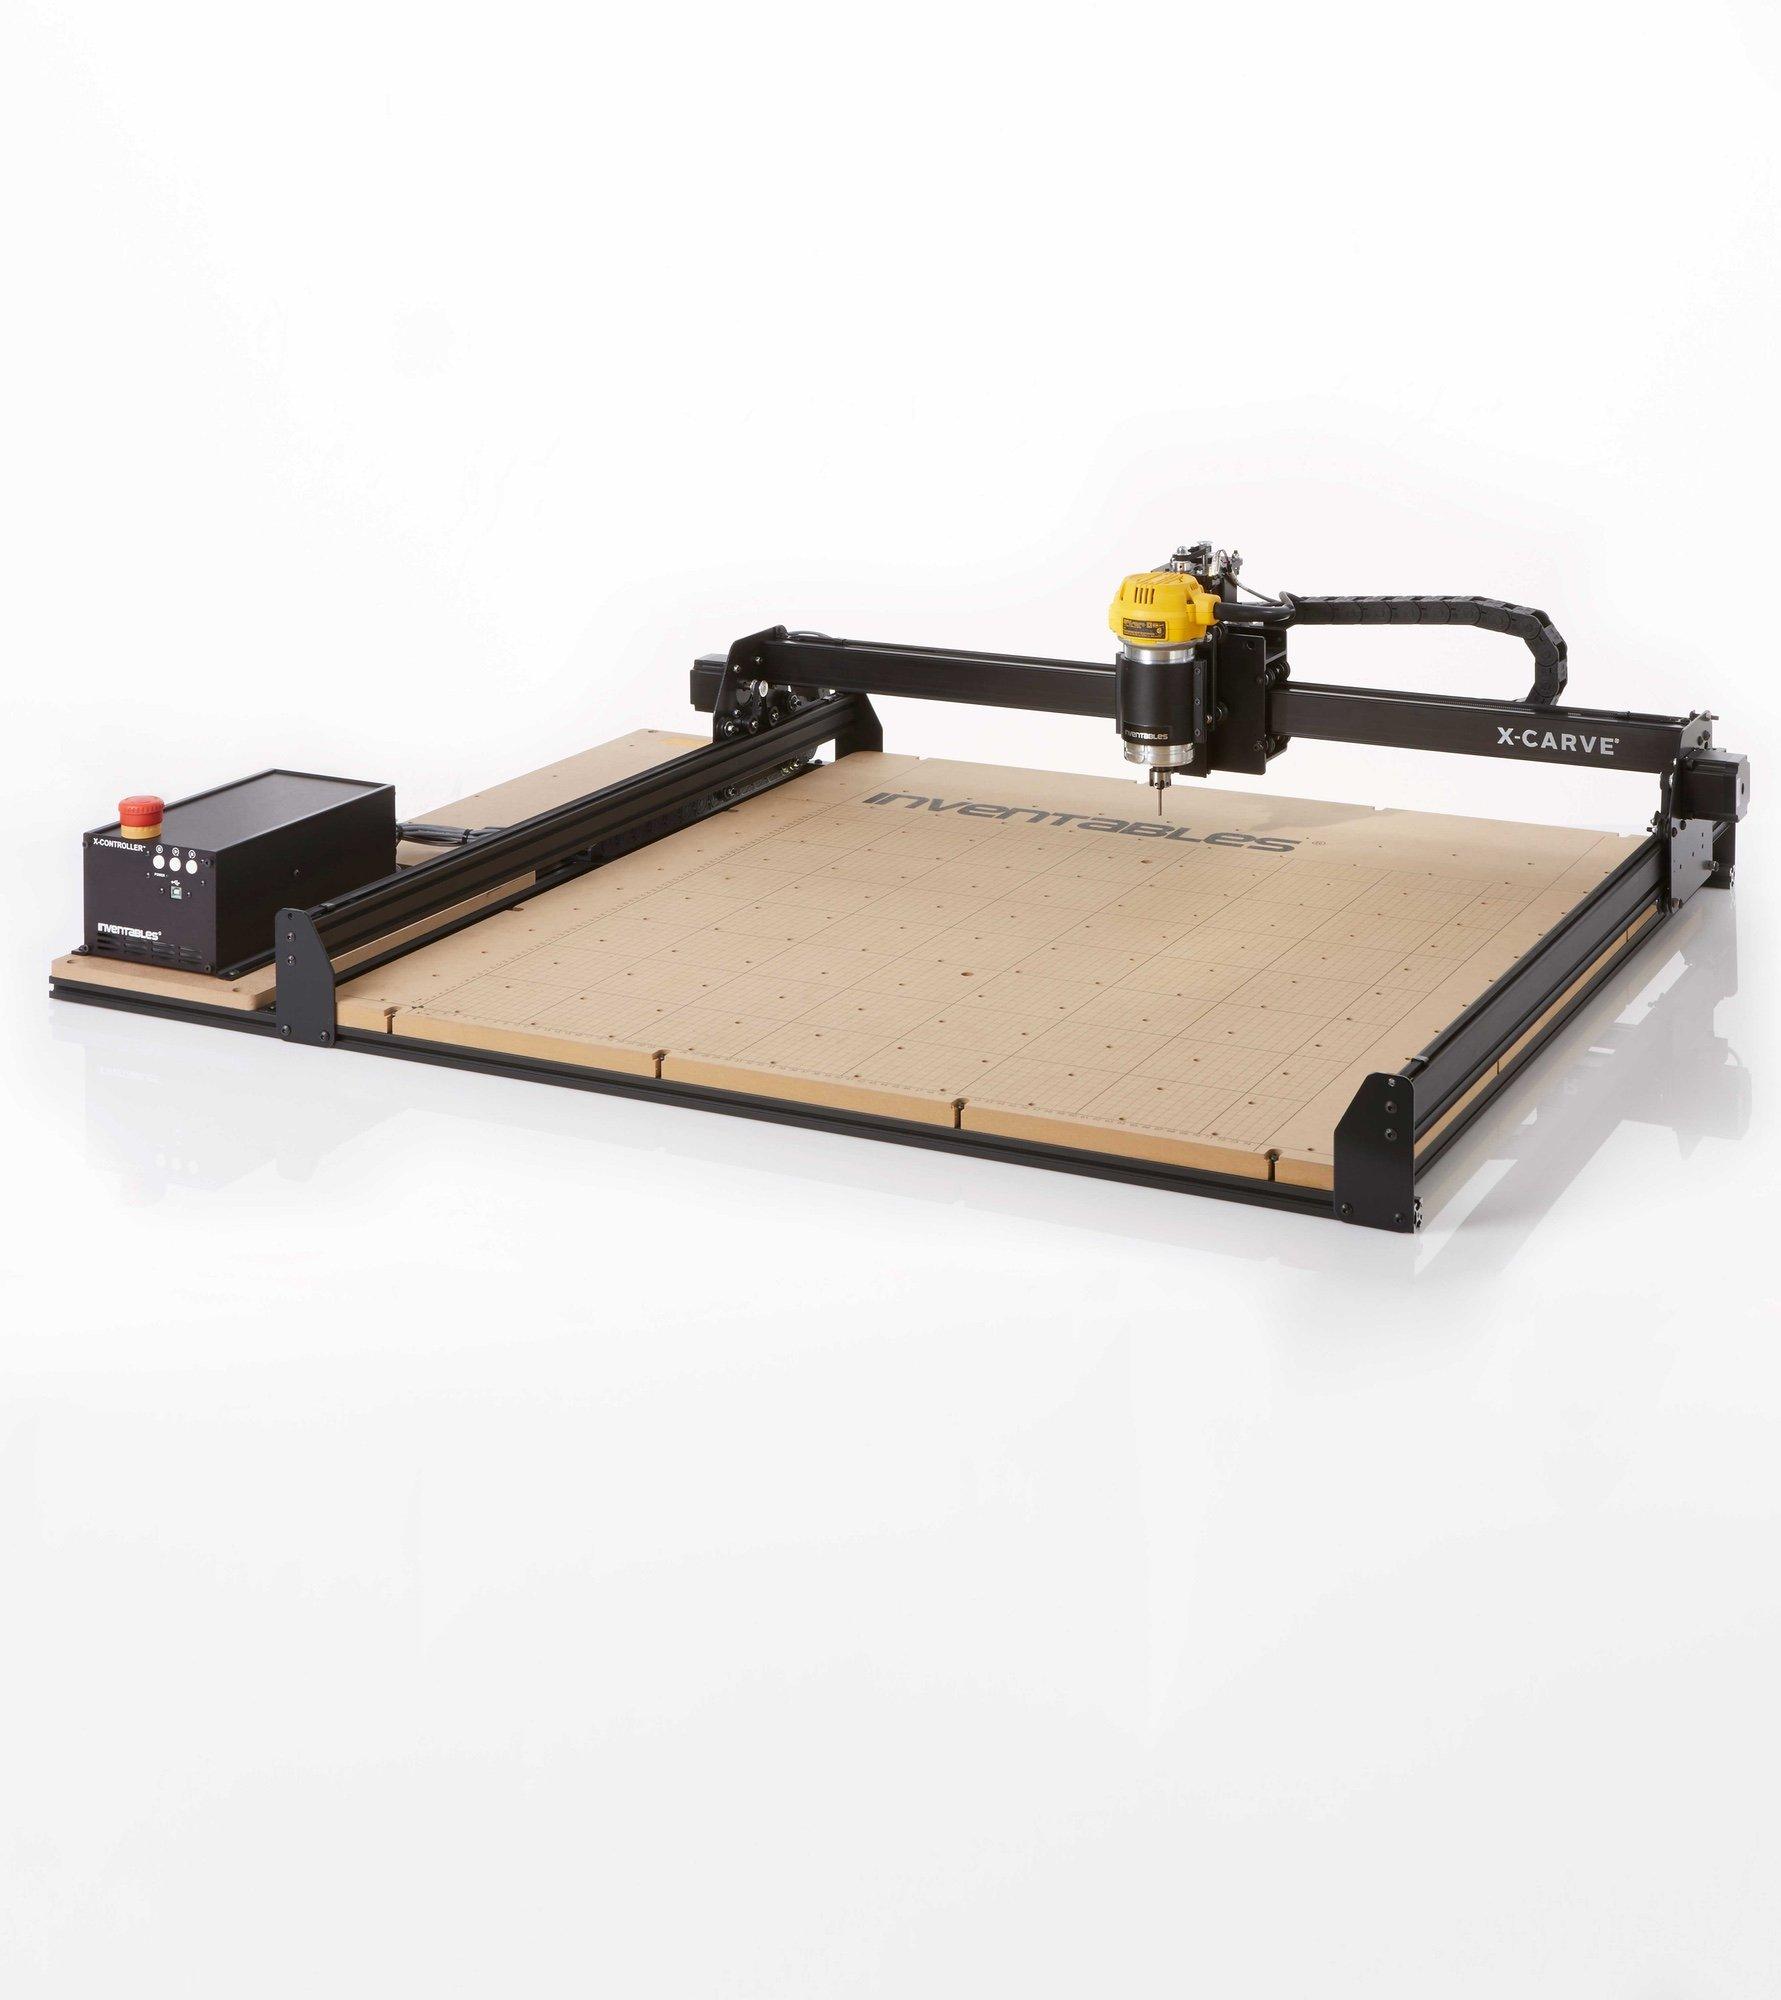 inventables x-carve cnc machine